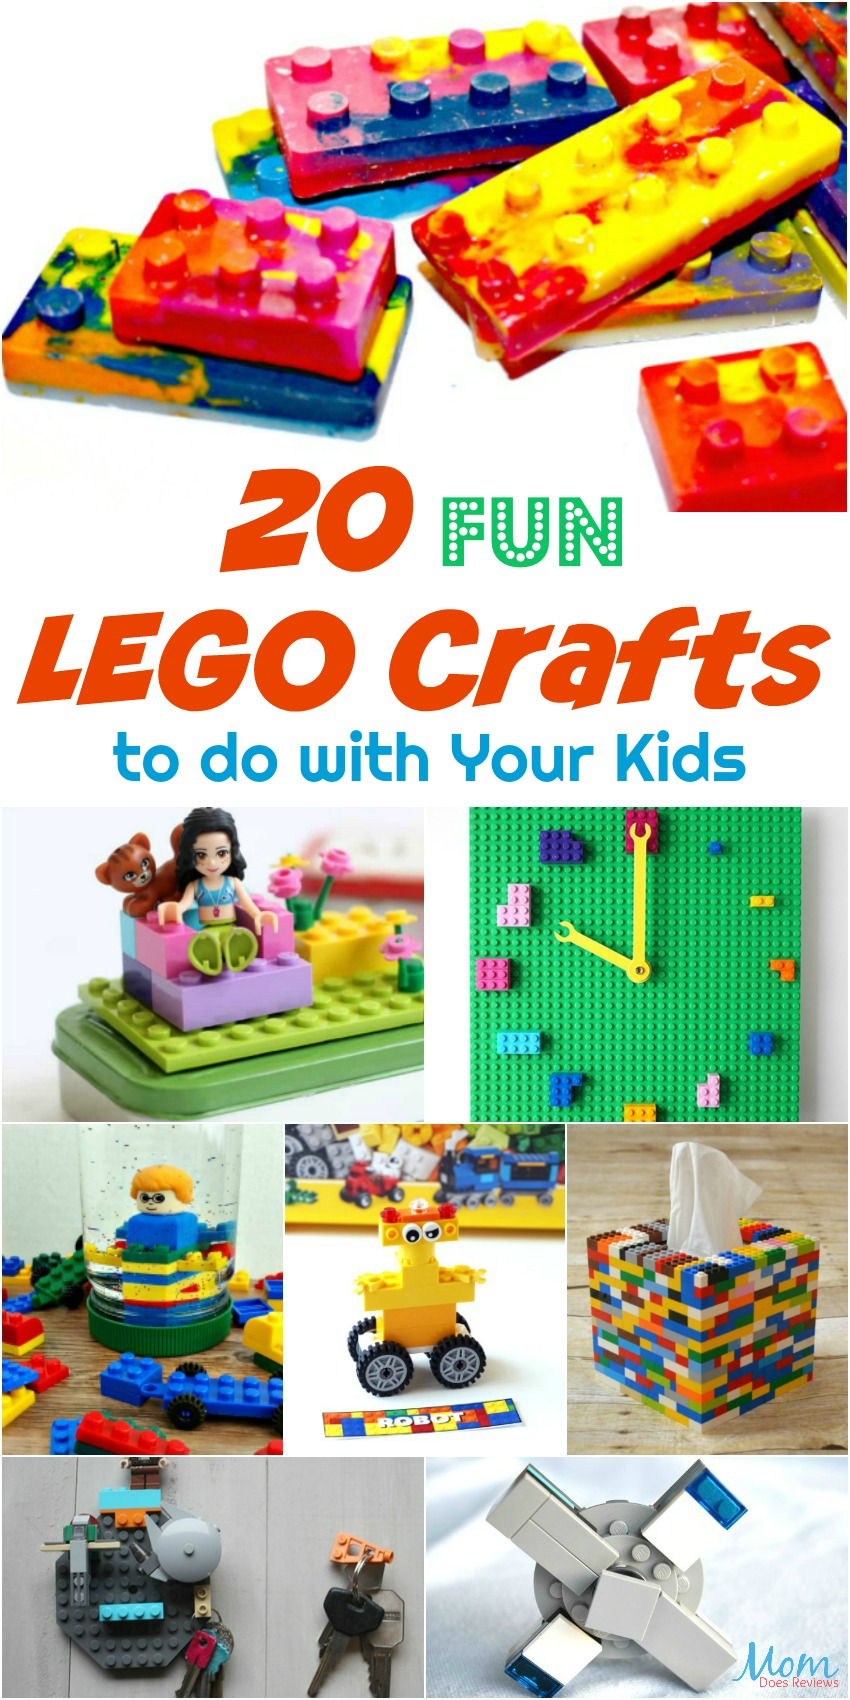 20 Fun LEGO Crafts to do with Your Kids #crafts #LEGOS #LEGO #funstuff #DIY